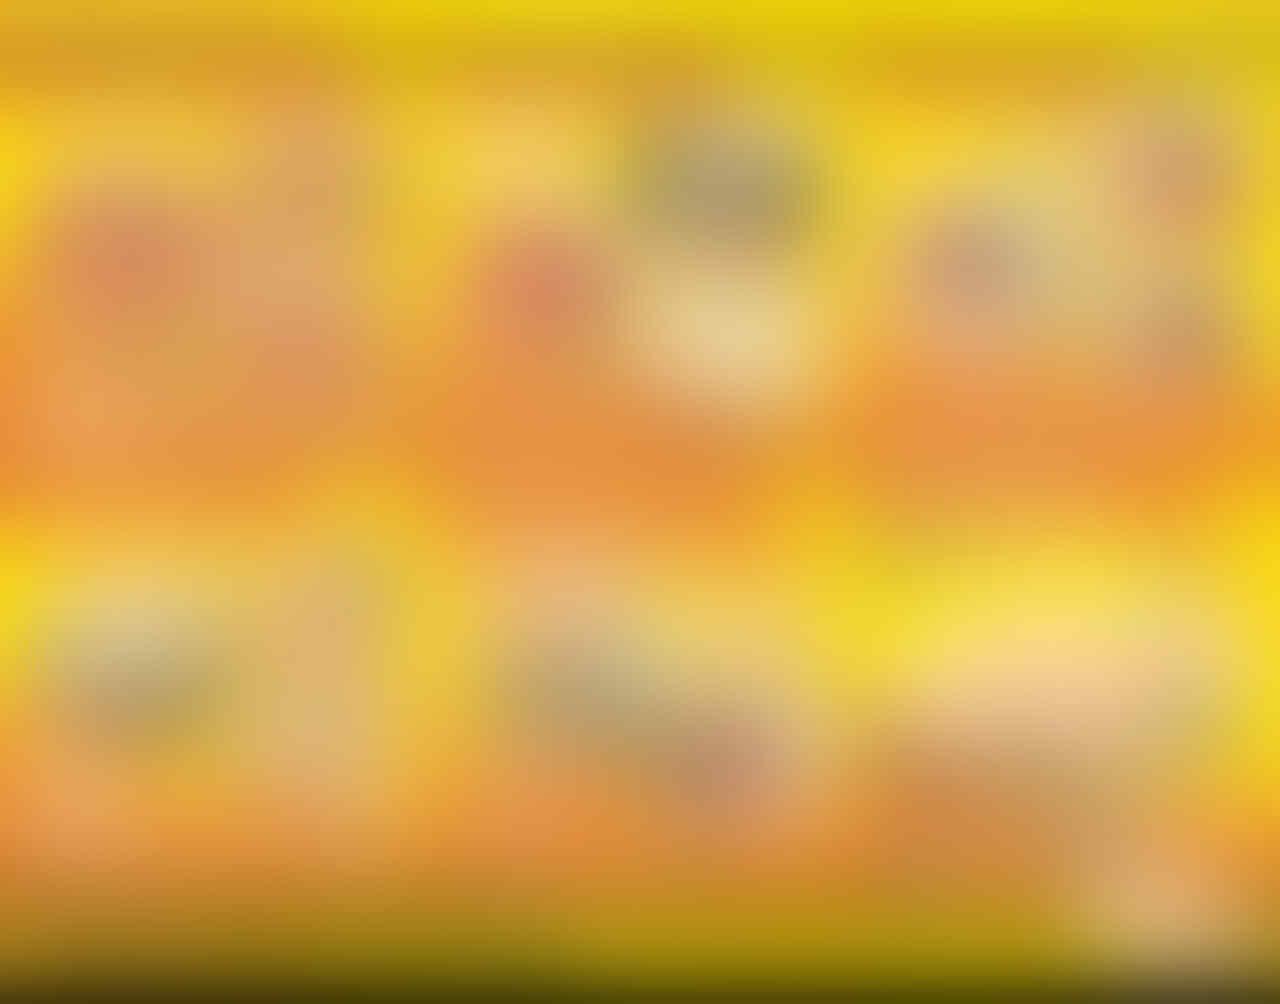 (WAJIB BACA) Membangun usaha bersama komunitas kaskuser, Pasta Kangen